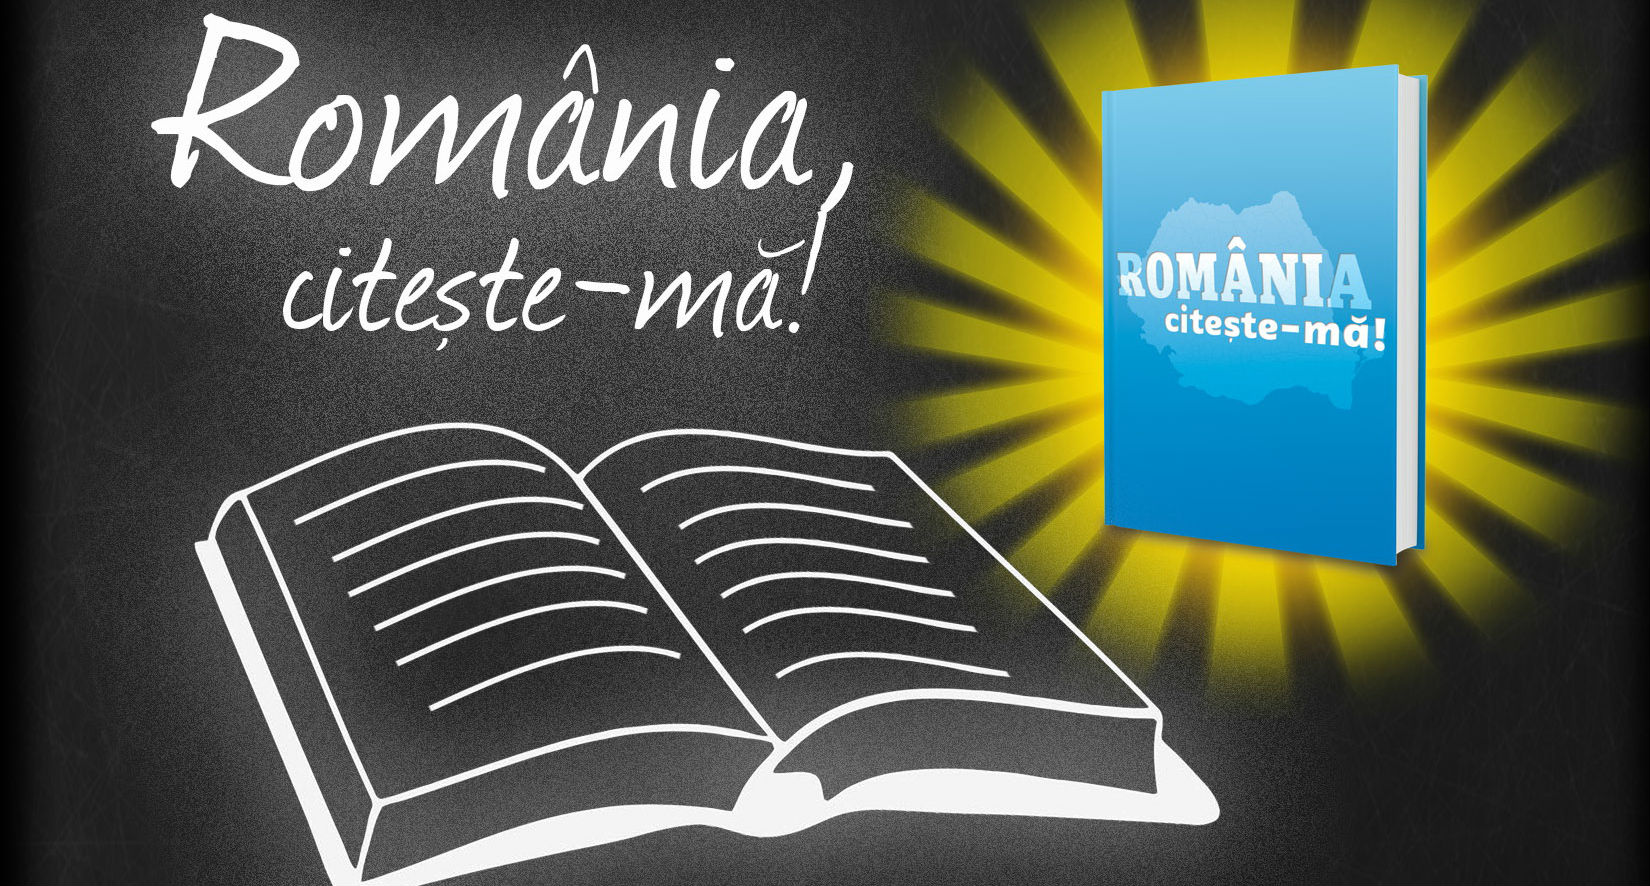 Romania, citeste-ma